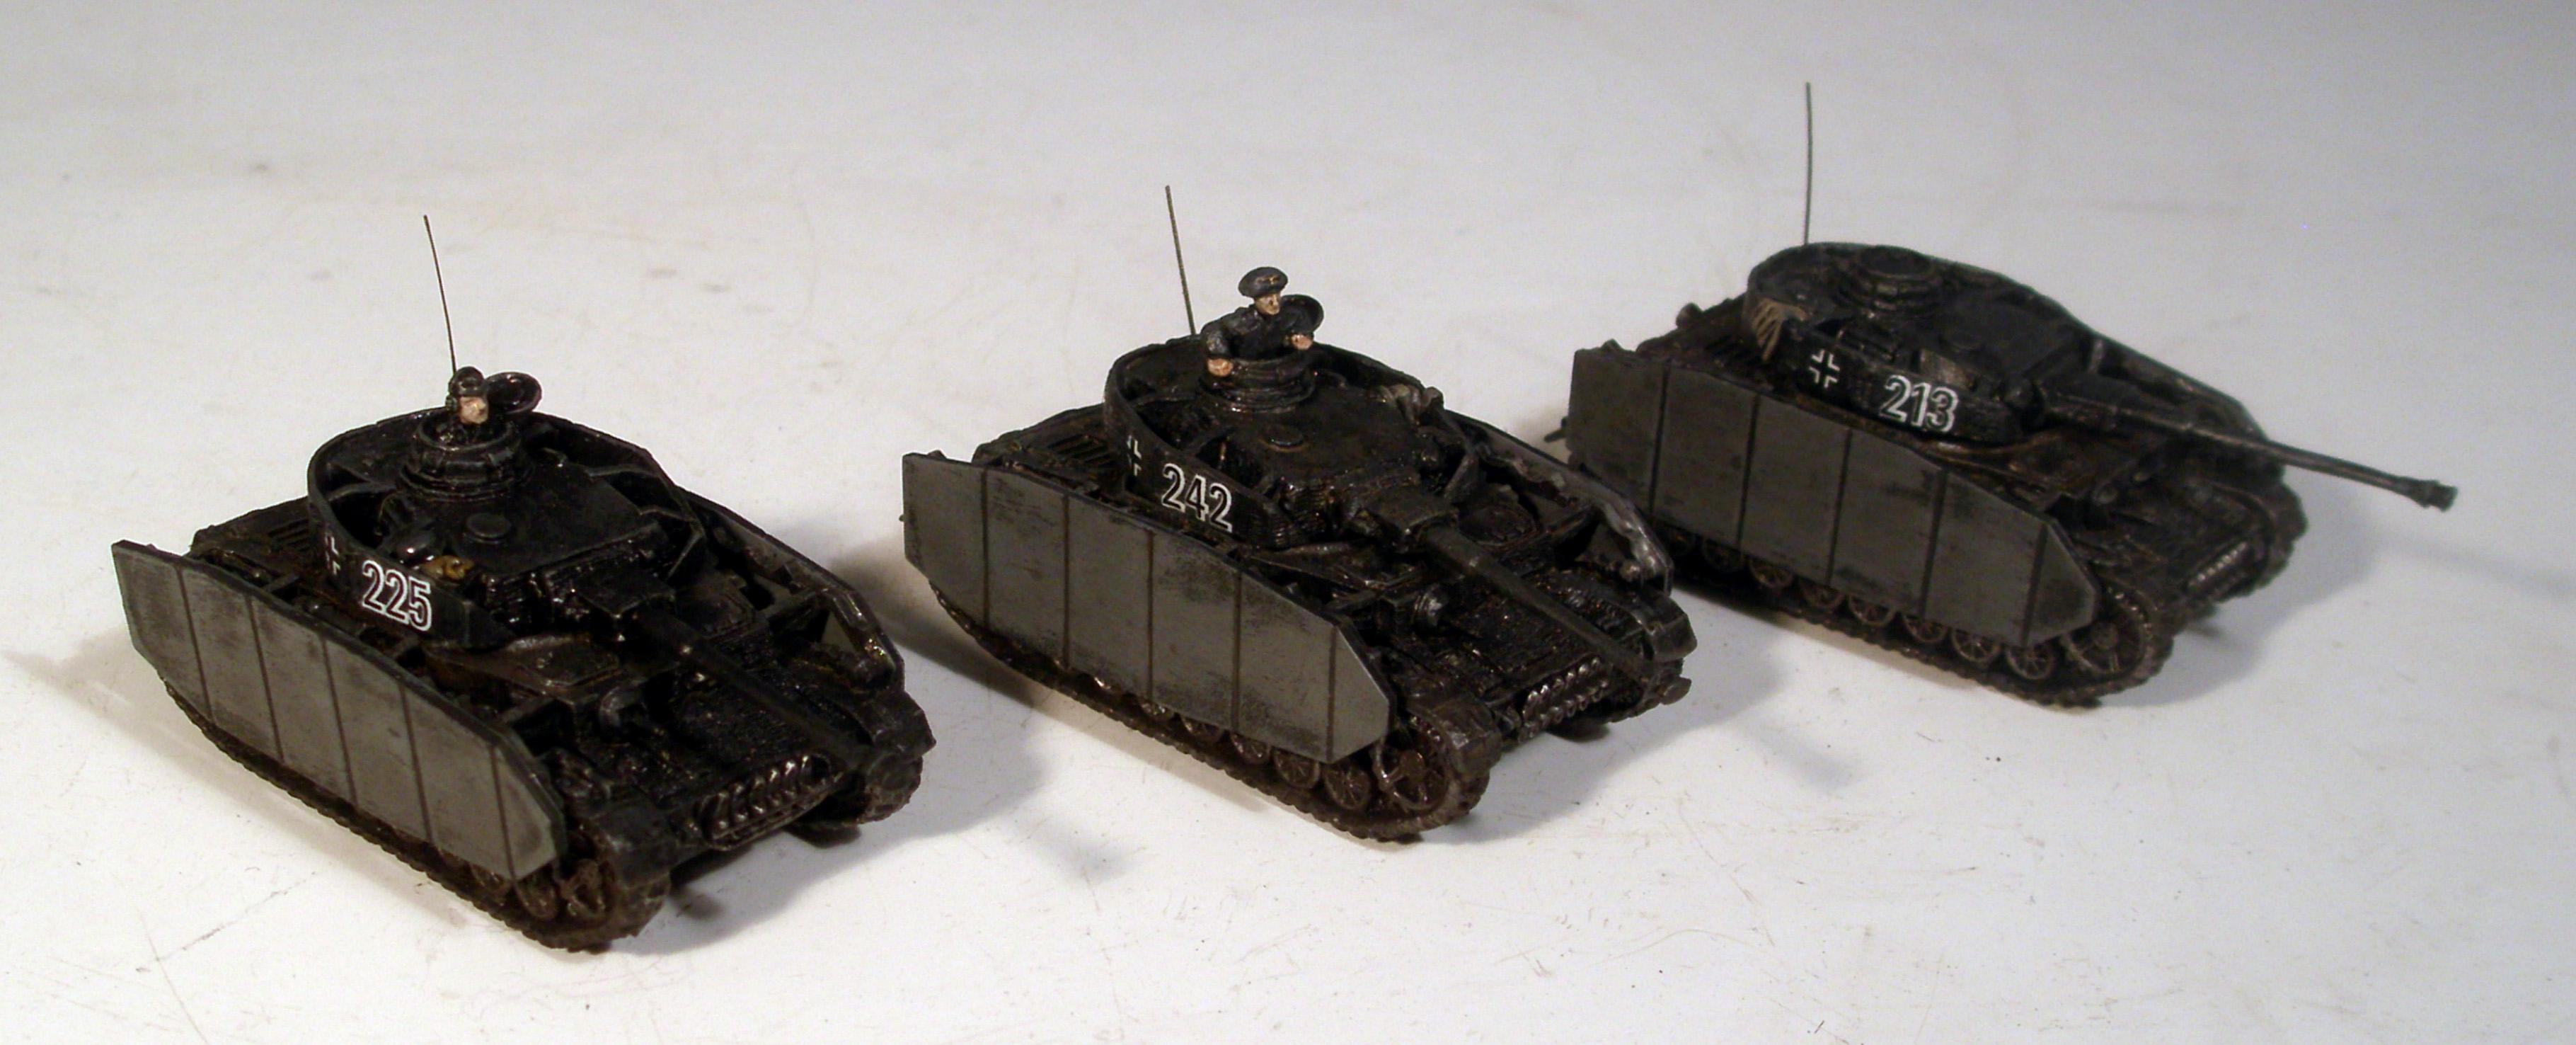 Flames Of War, Germans, Panzer, Panzer Iv